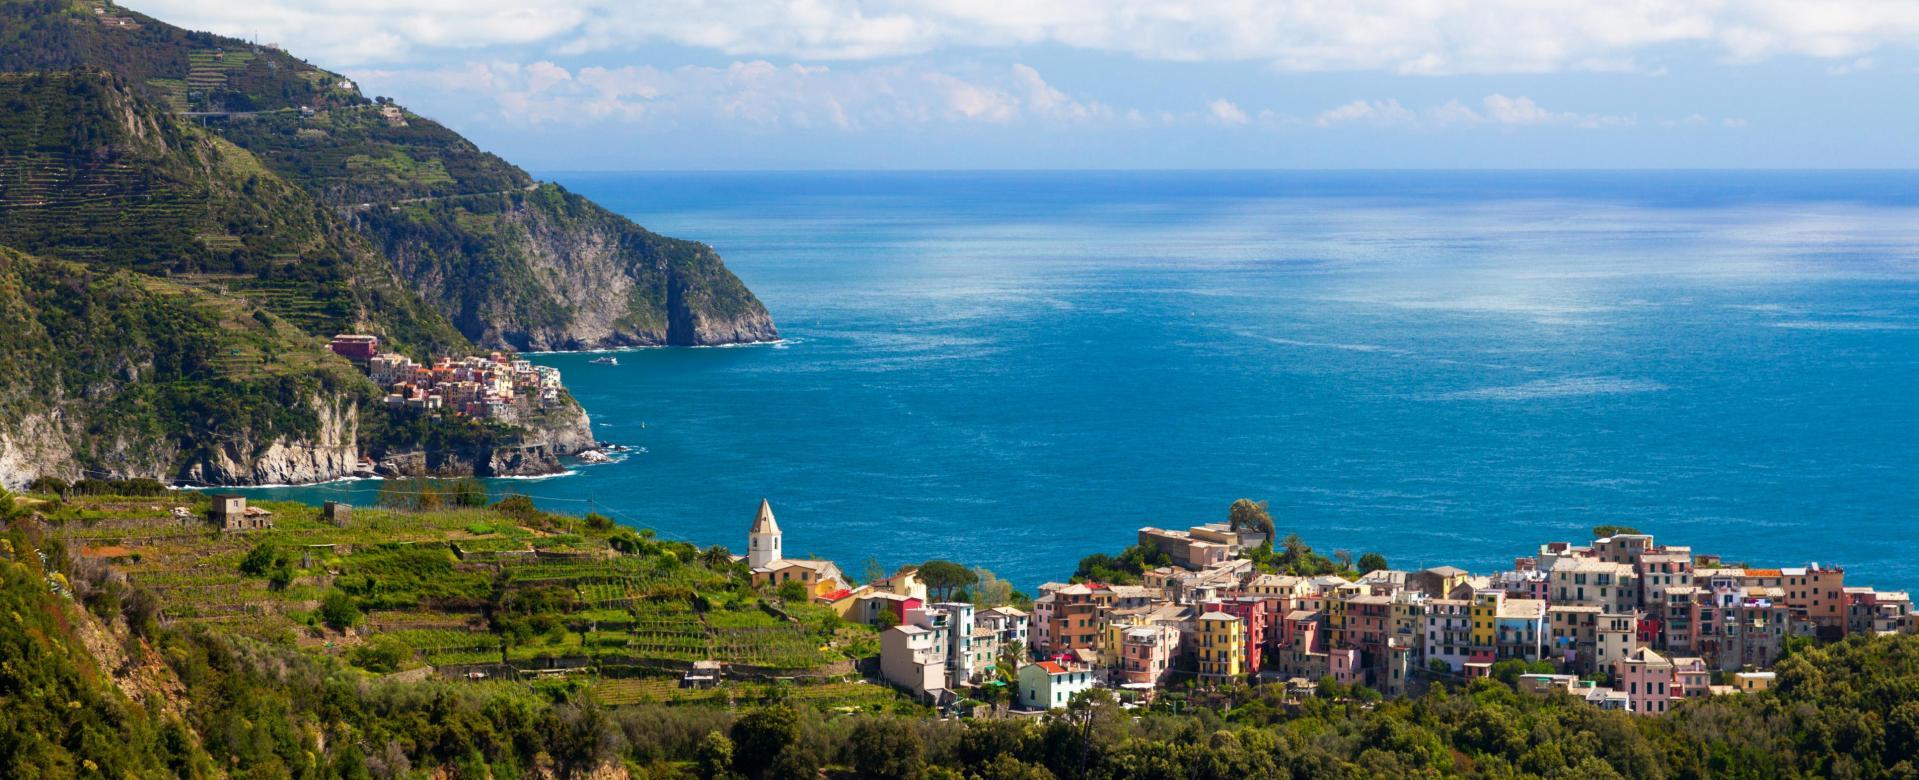 Voyage à pied : De portofino aux cinque terre